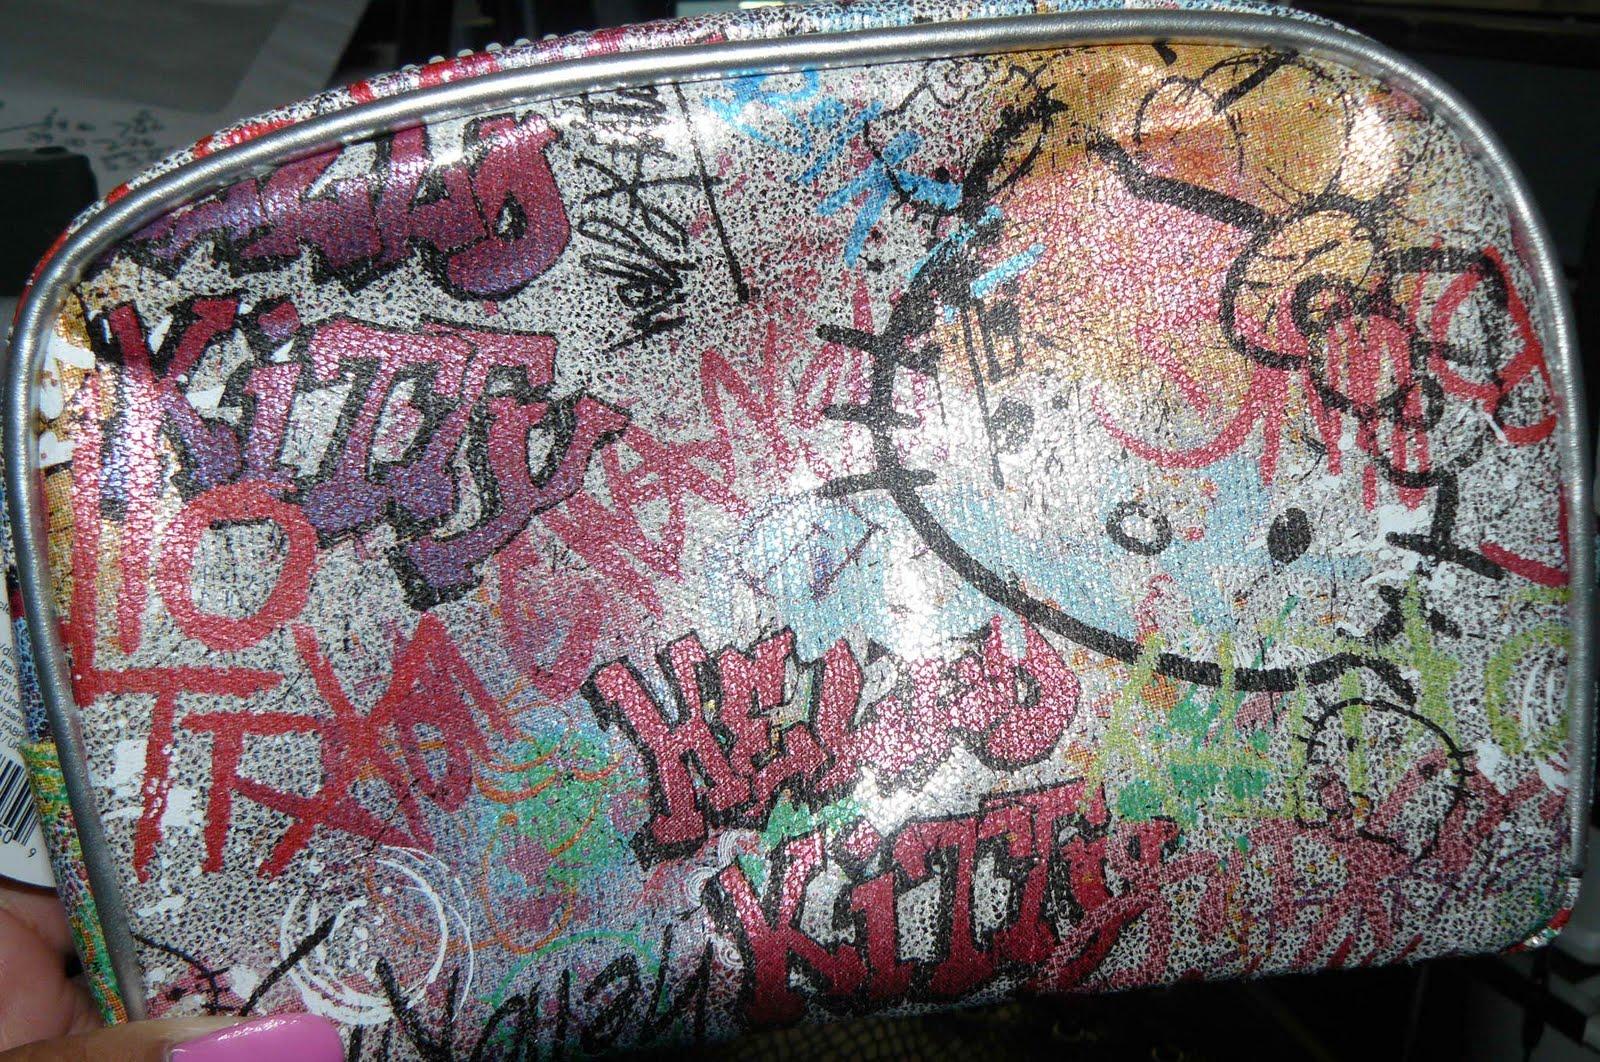 Makeupbyzee Hello Kitty Graffiti Bag